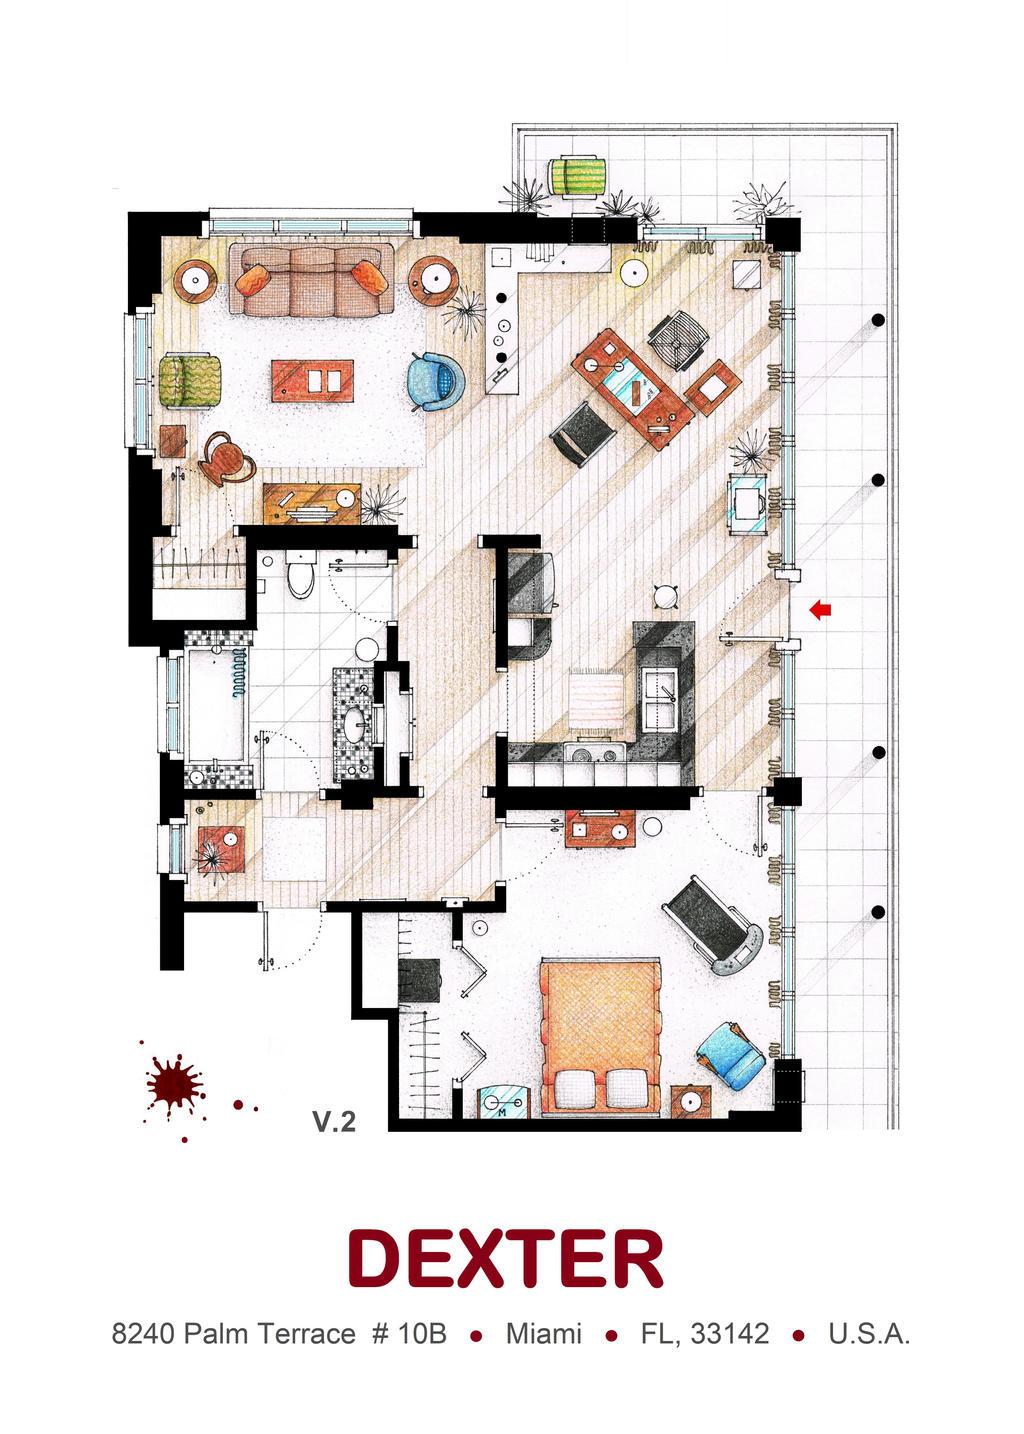 Floorplan of Dexter Morgan's Apartment v.2